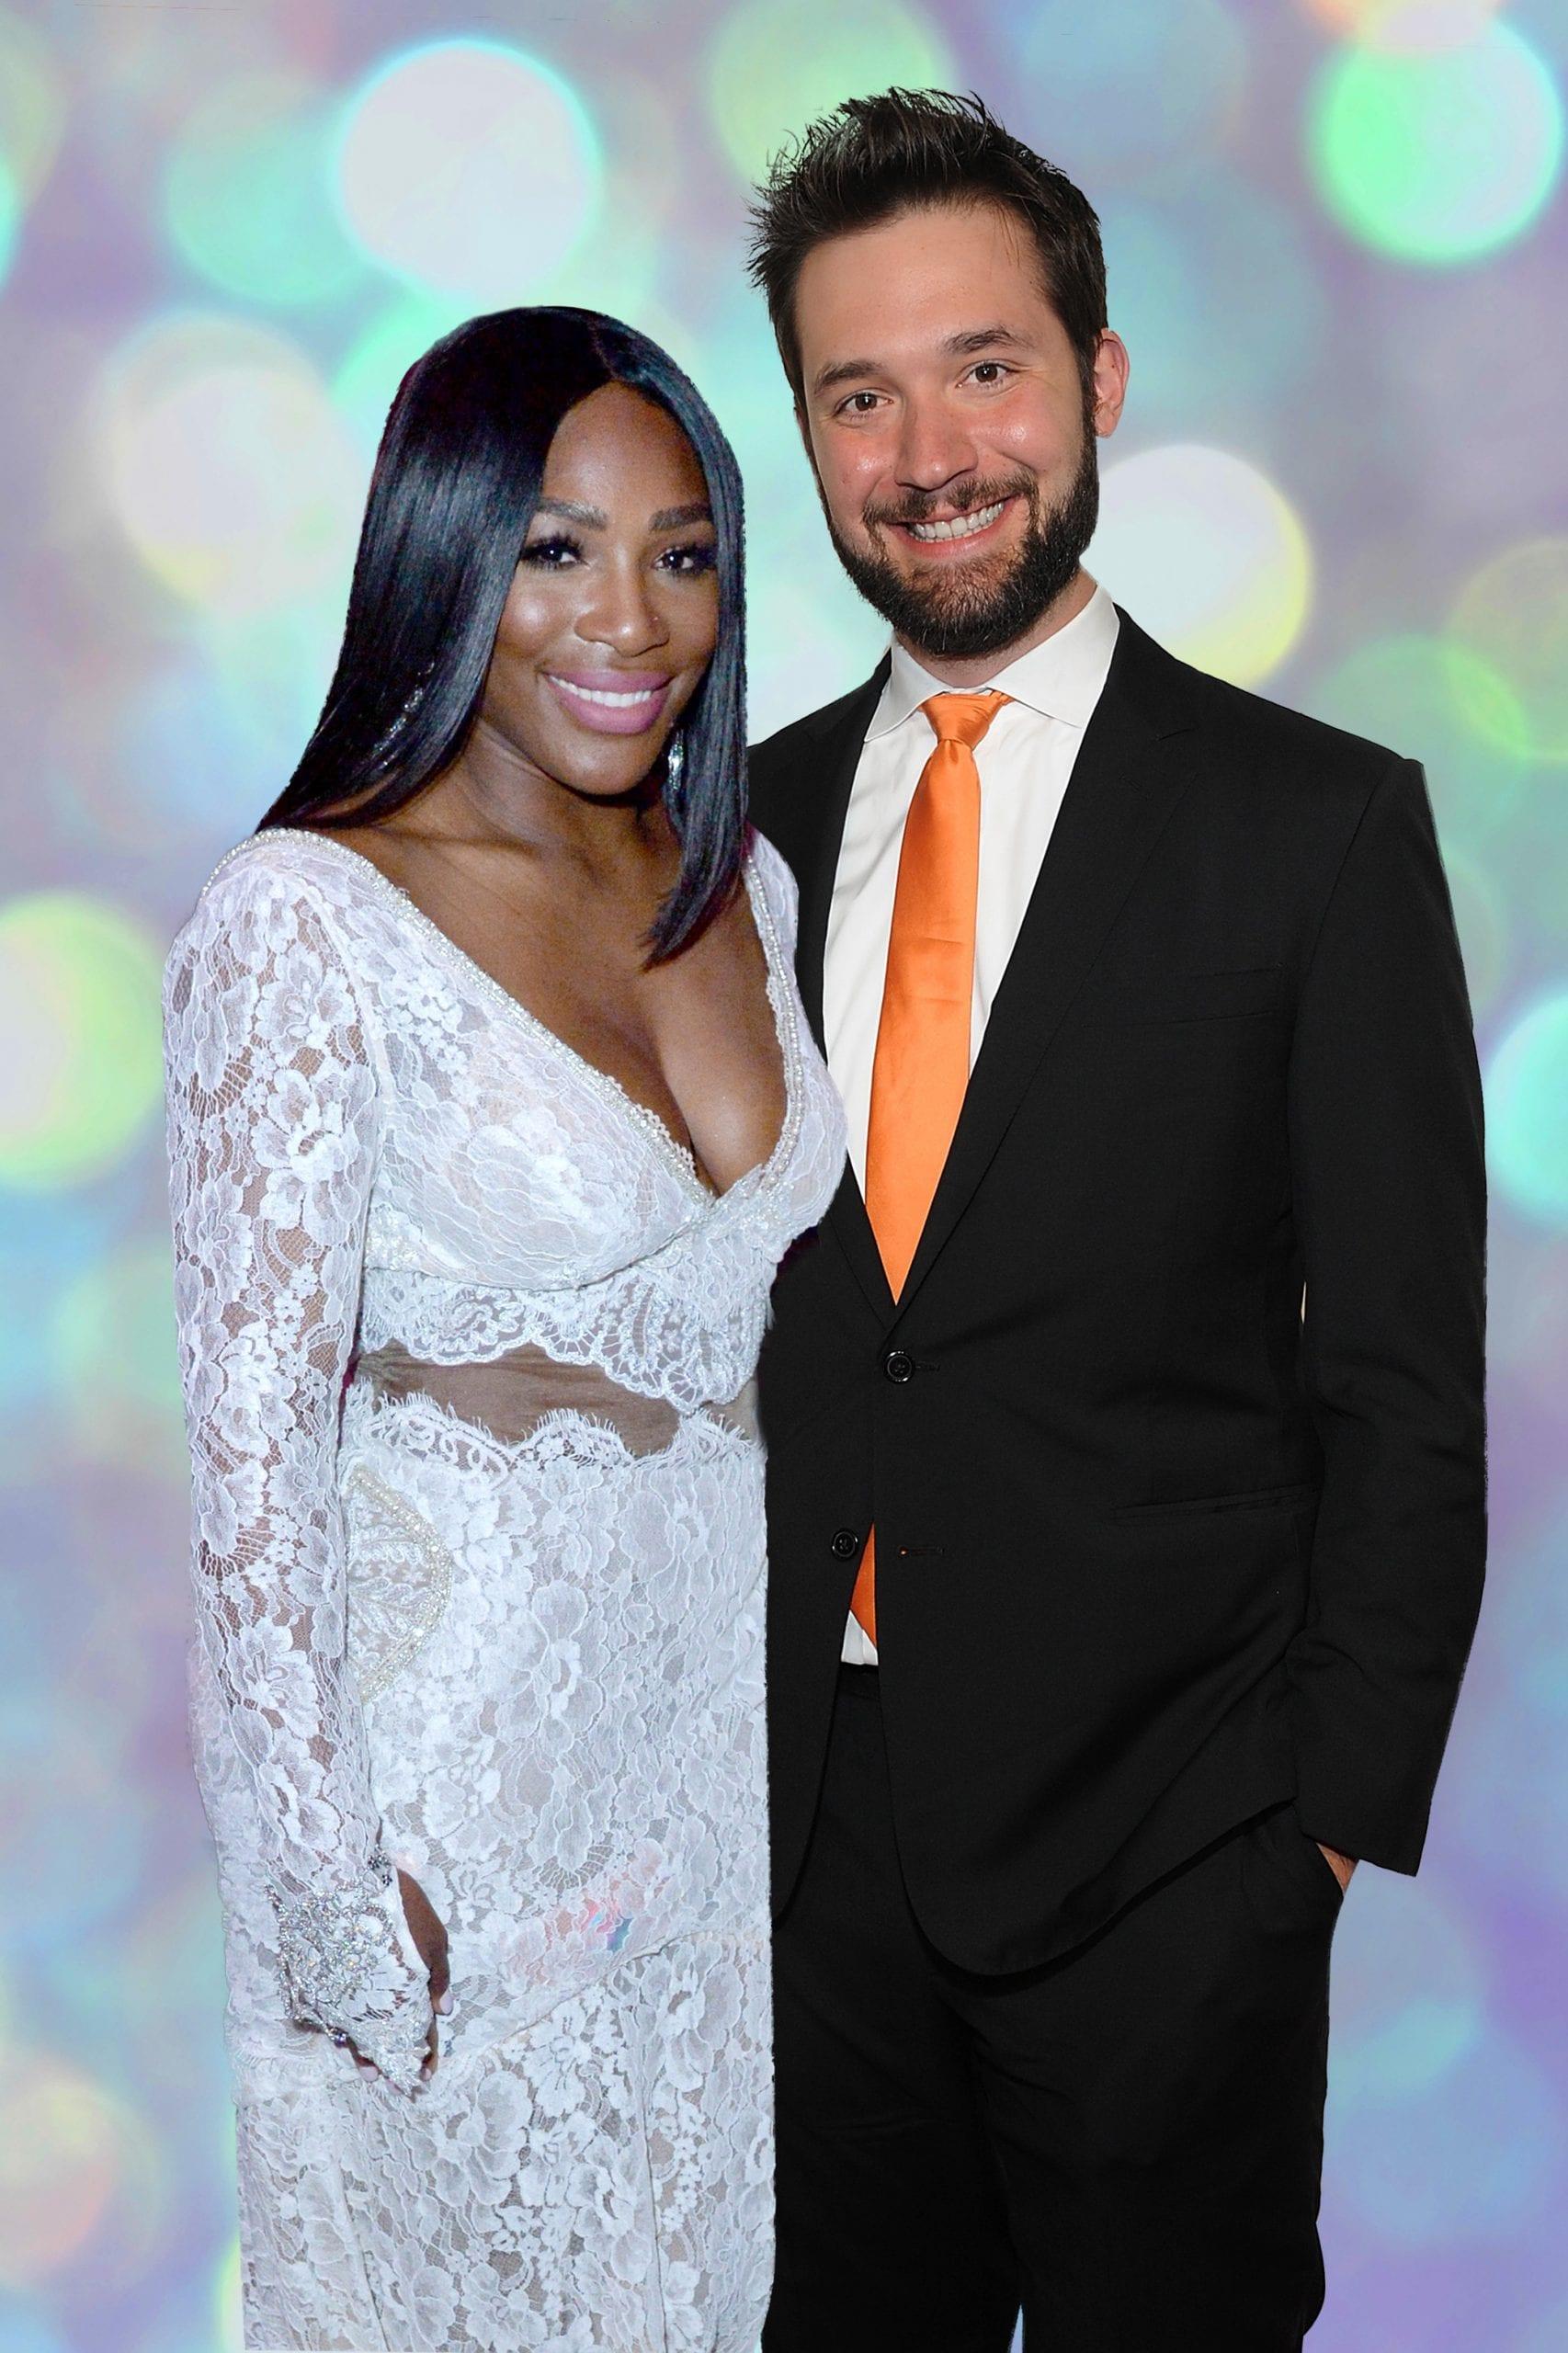 USA Préparation du mariage de rêve de Serena Williamsphotos